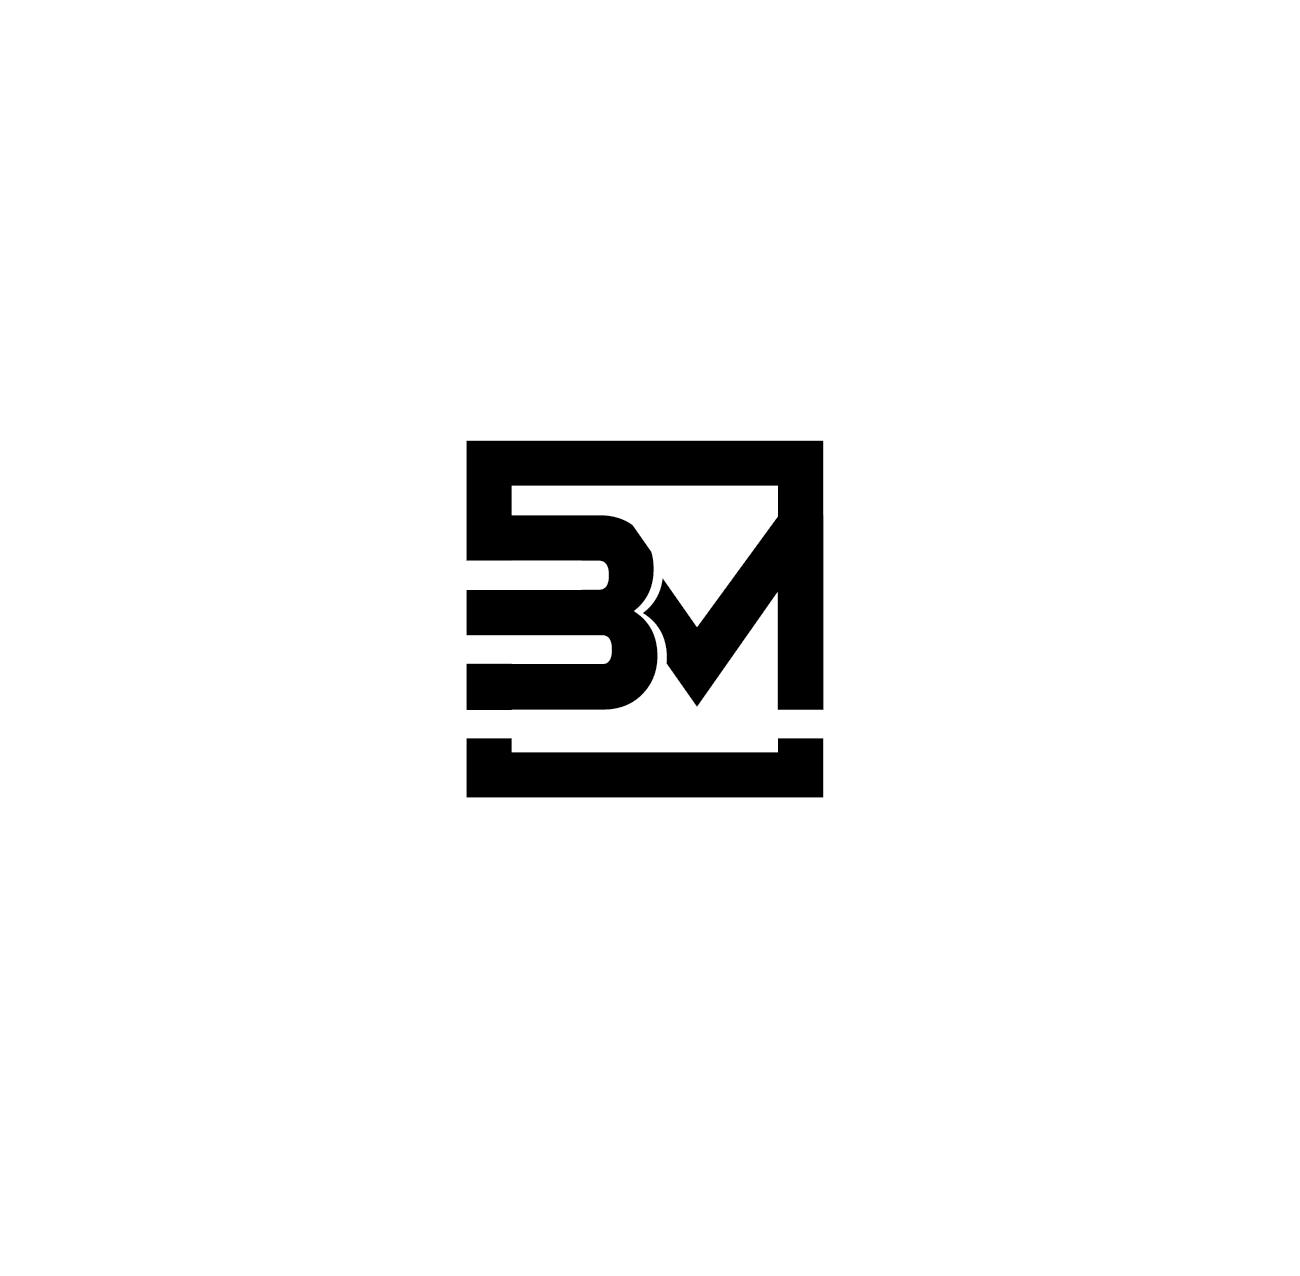 design #95 of rexmark